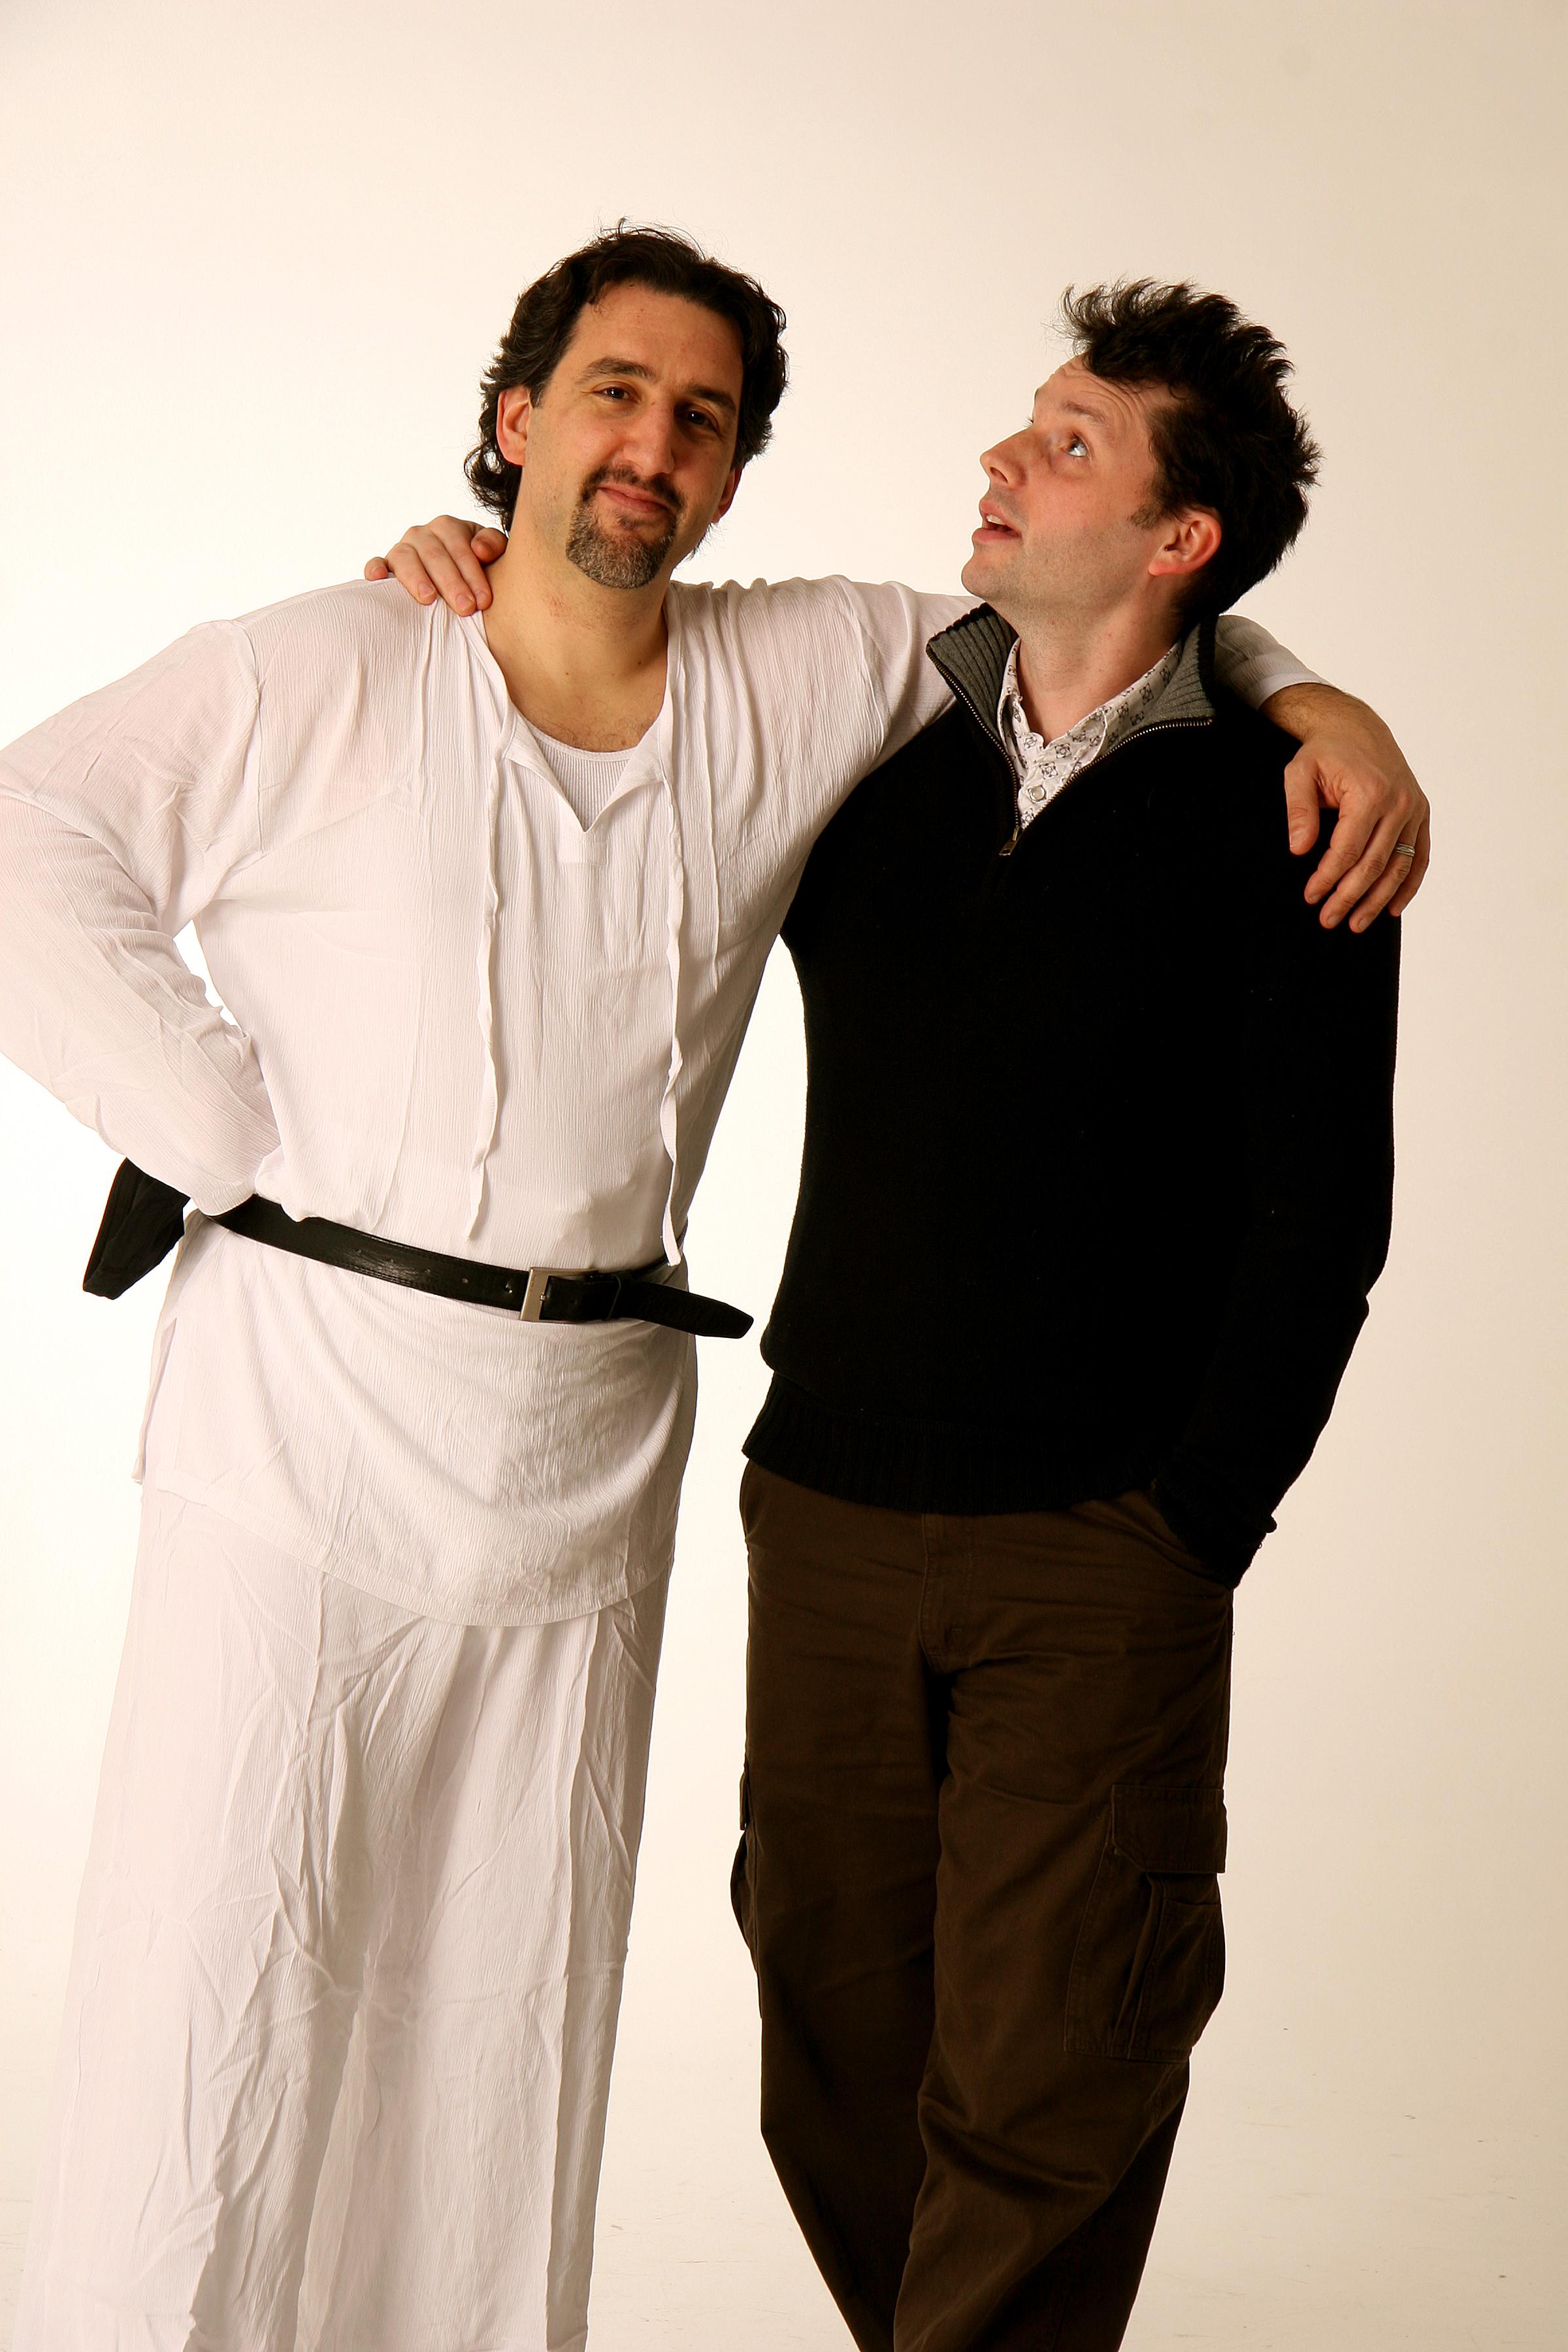 John and Brendon